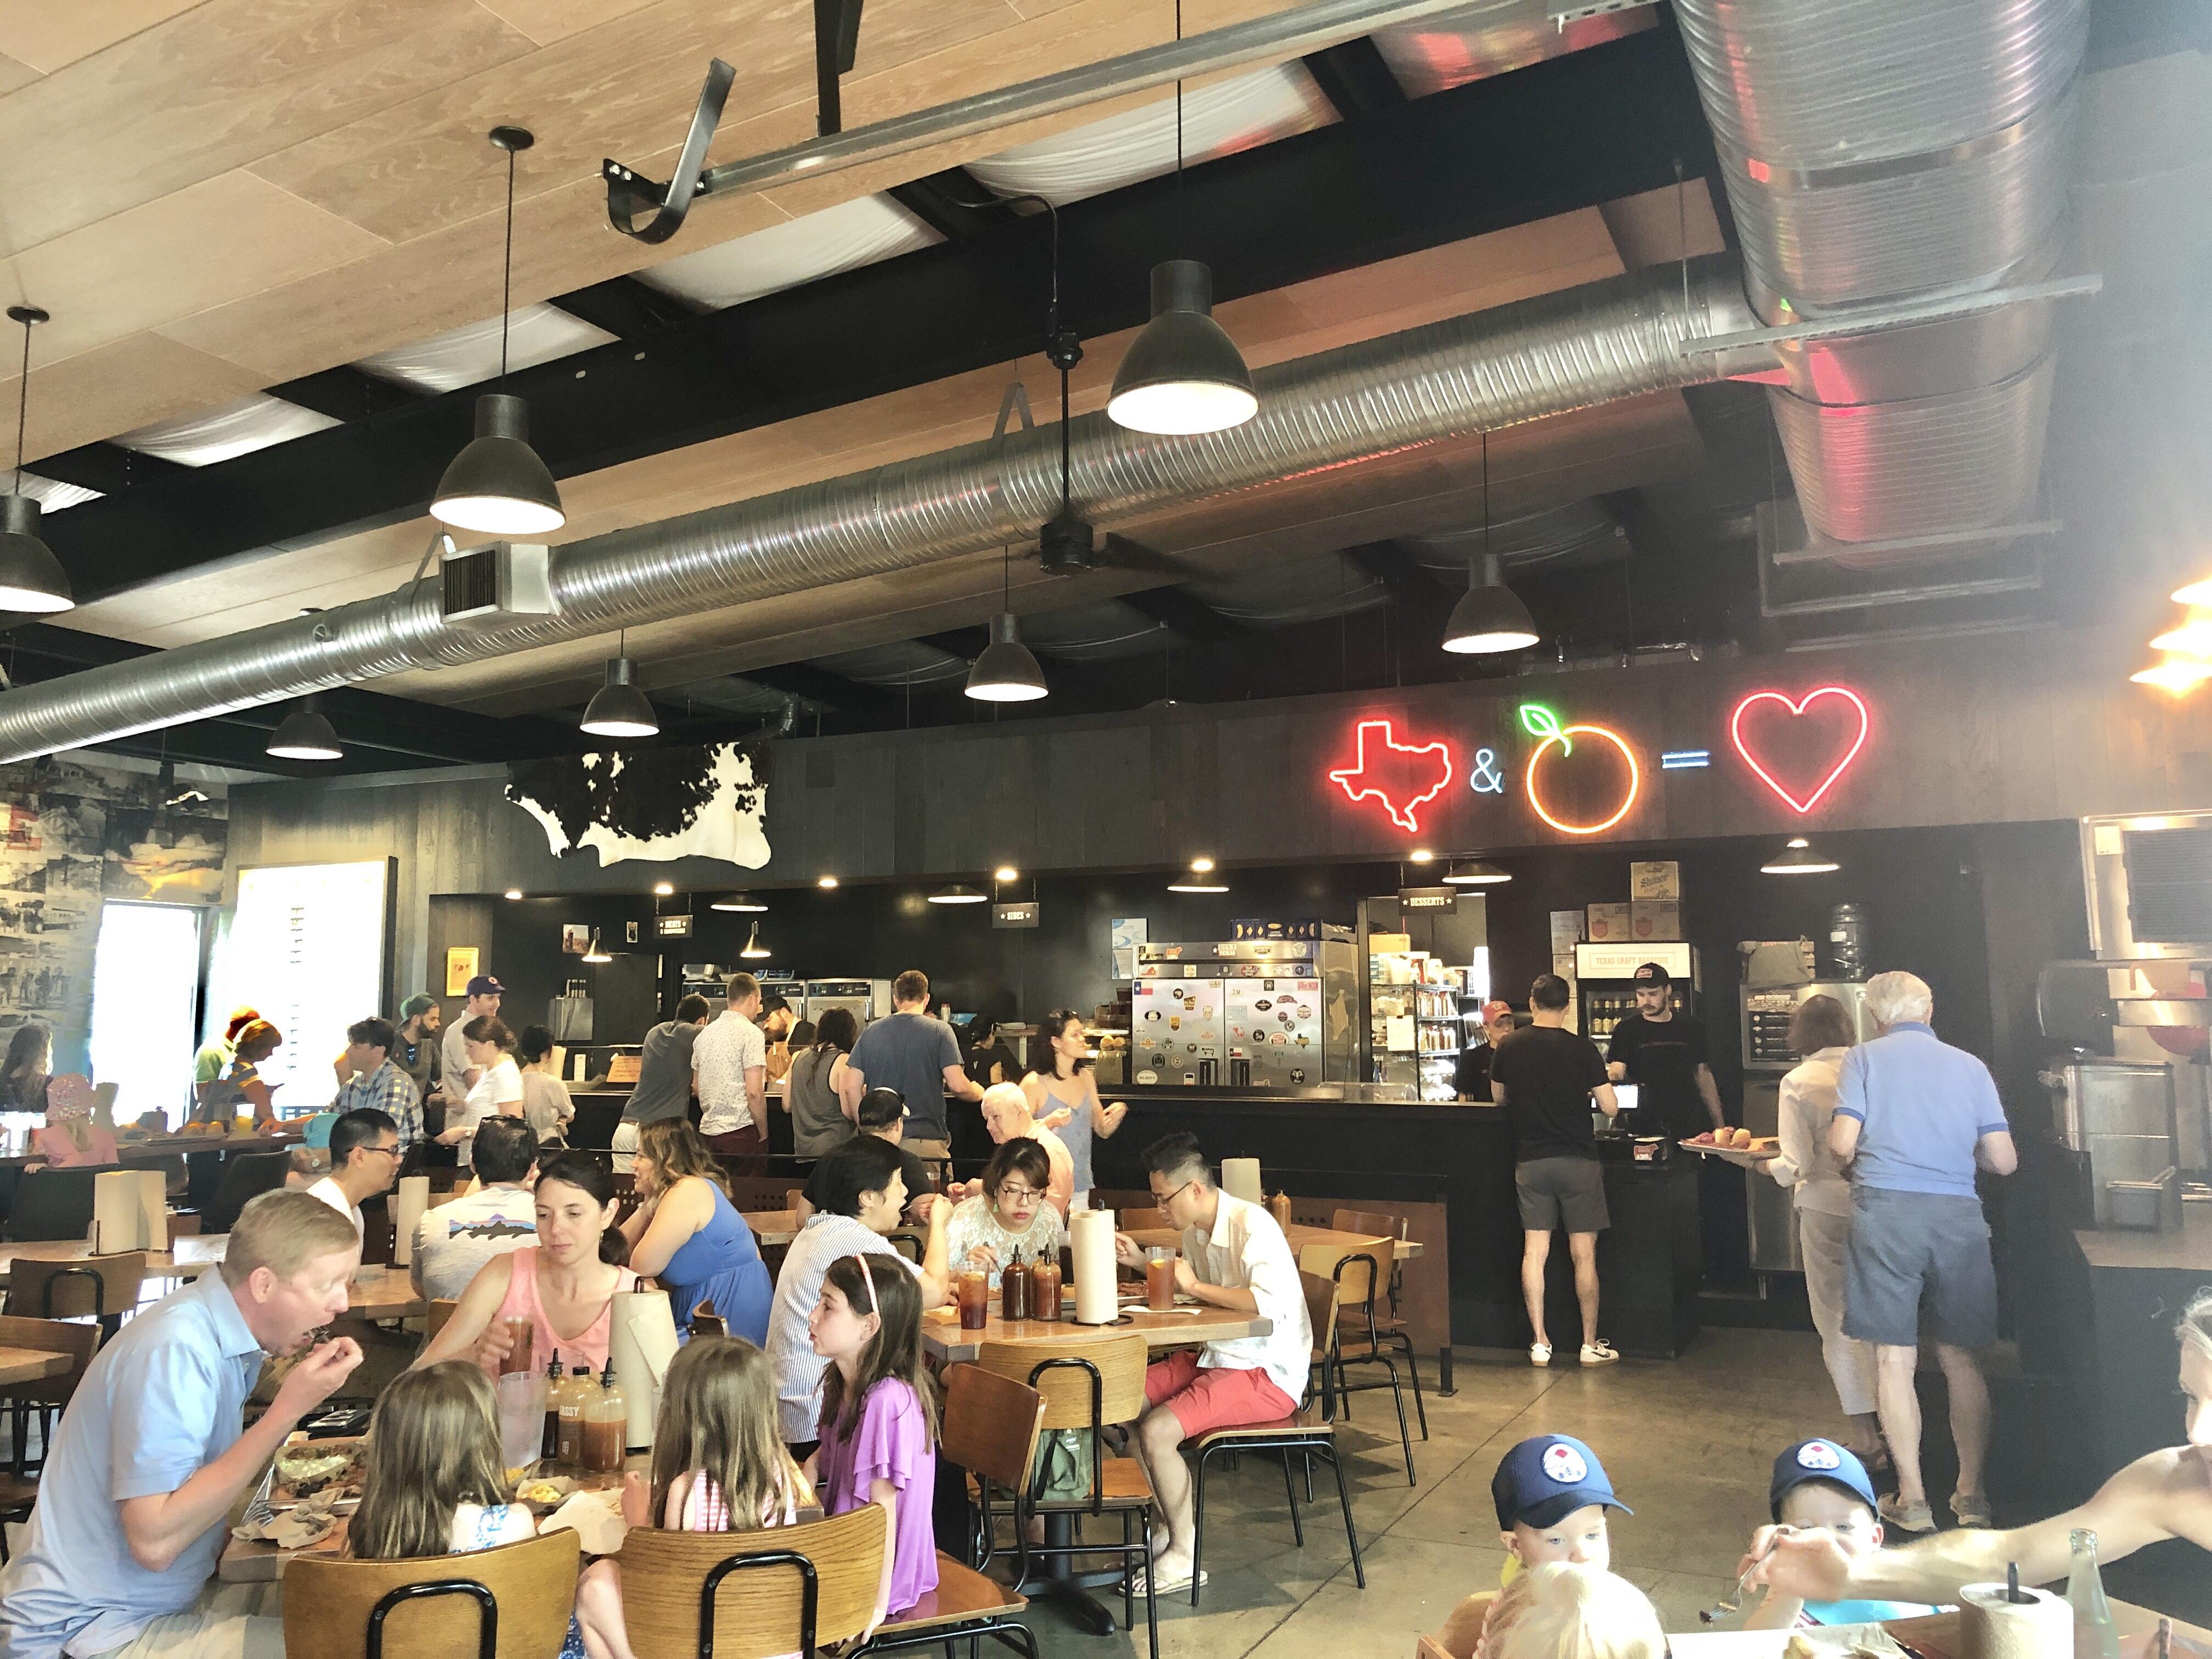 The interior restaurant space of ZZQ in Richmond, Virginia